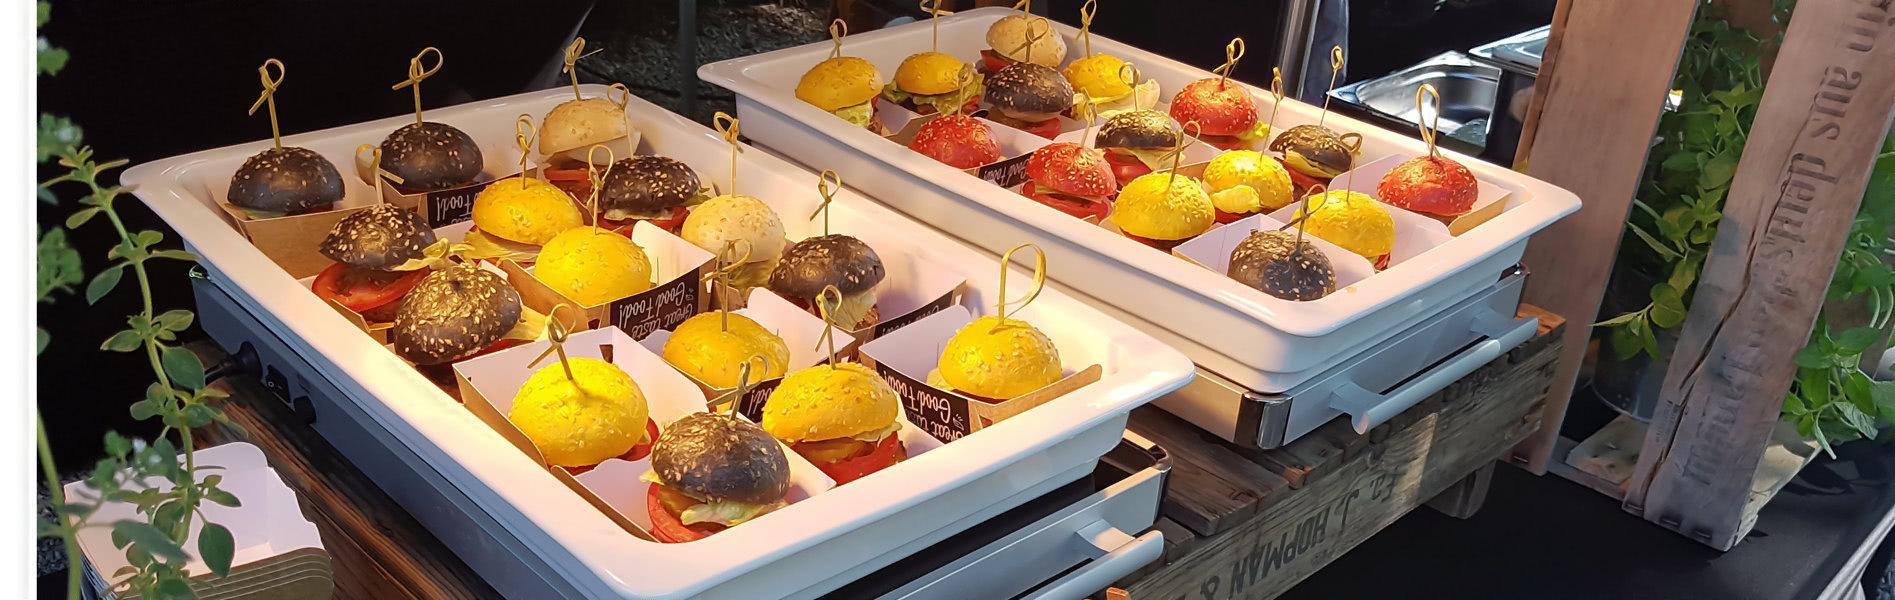 Mini-Burger in Boxen - UNIKORN Catering München - Steetfood aus dem Foodtruck